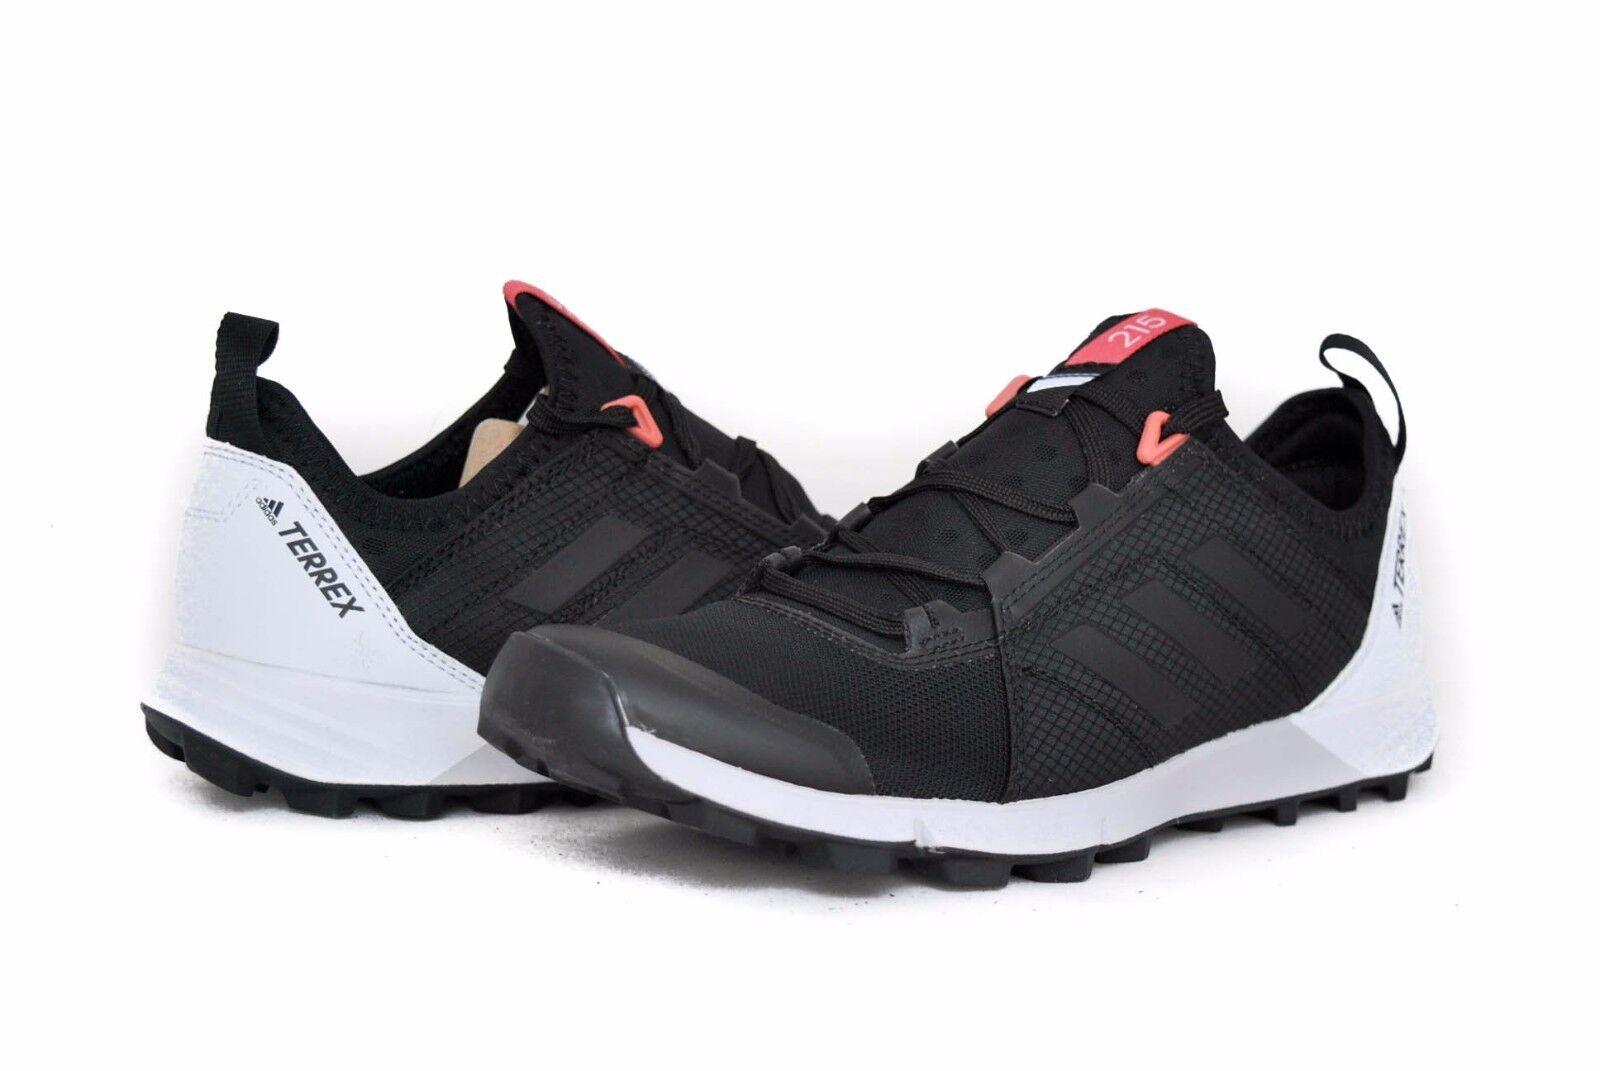 Adidas Women's Terrex Agravic Speed BB1960 in Black Sz 6-9 New